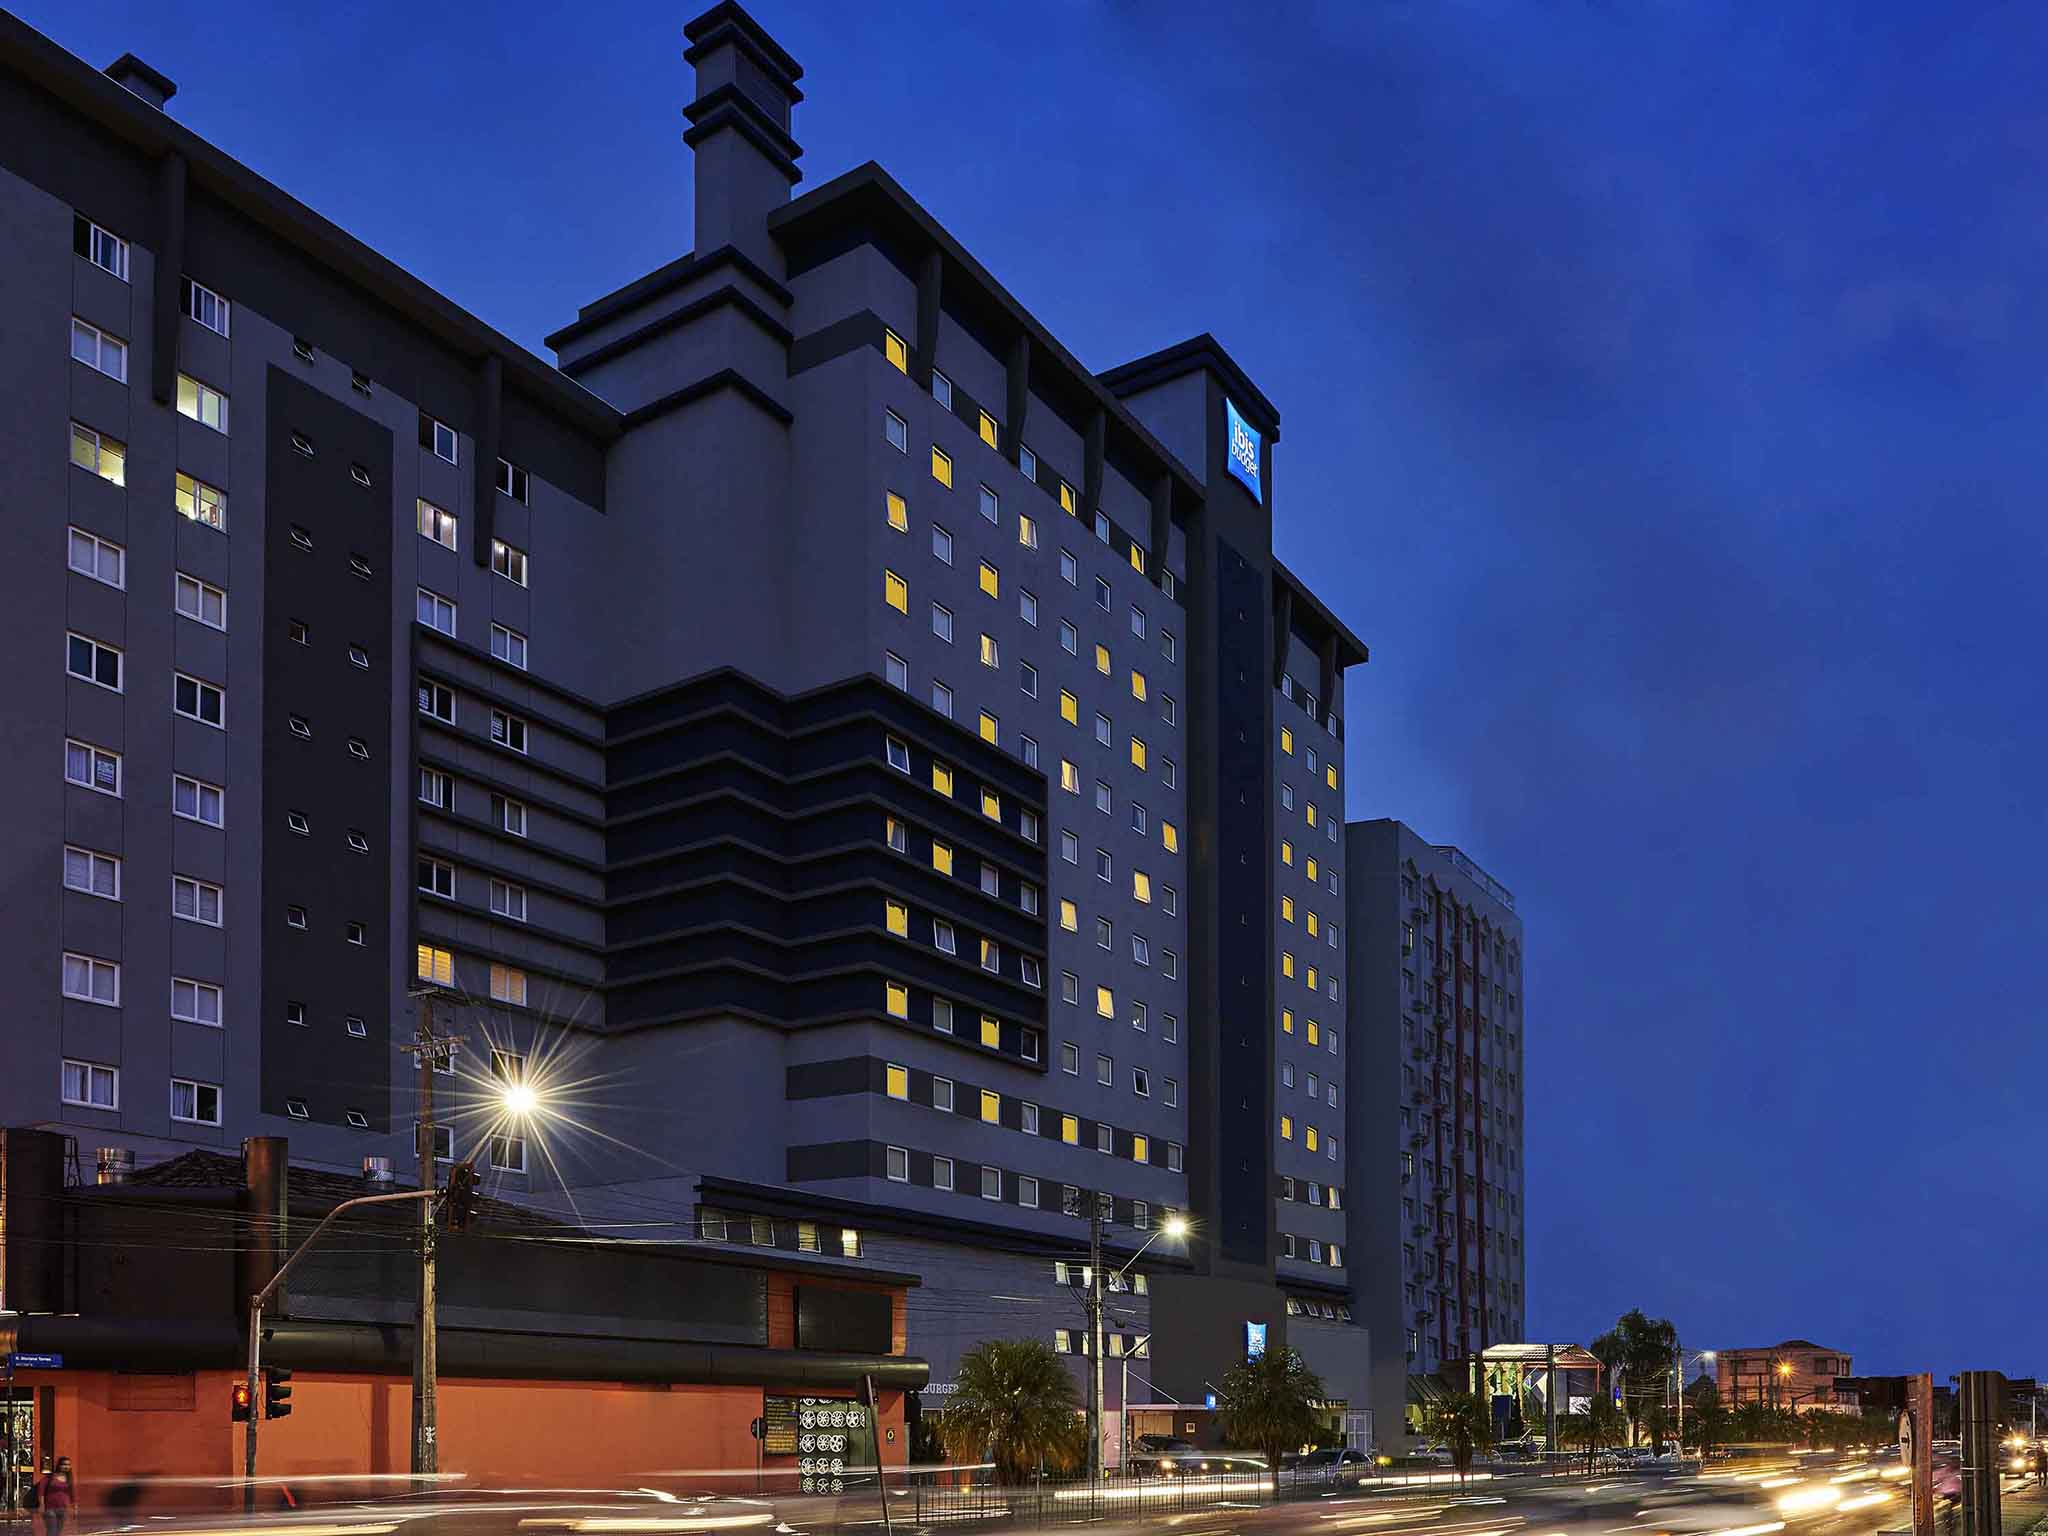 Hotel ibis budget curitiba centro book your hotel in curitiba for Hotel centro